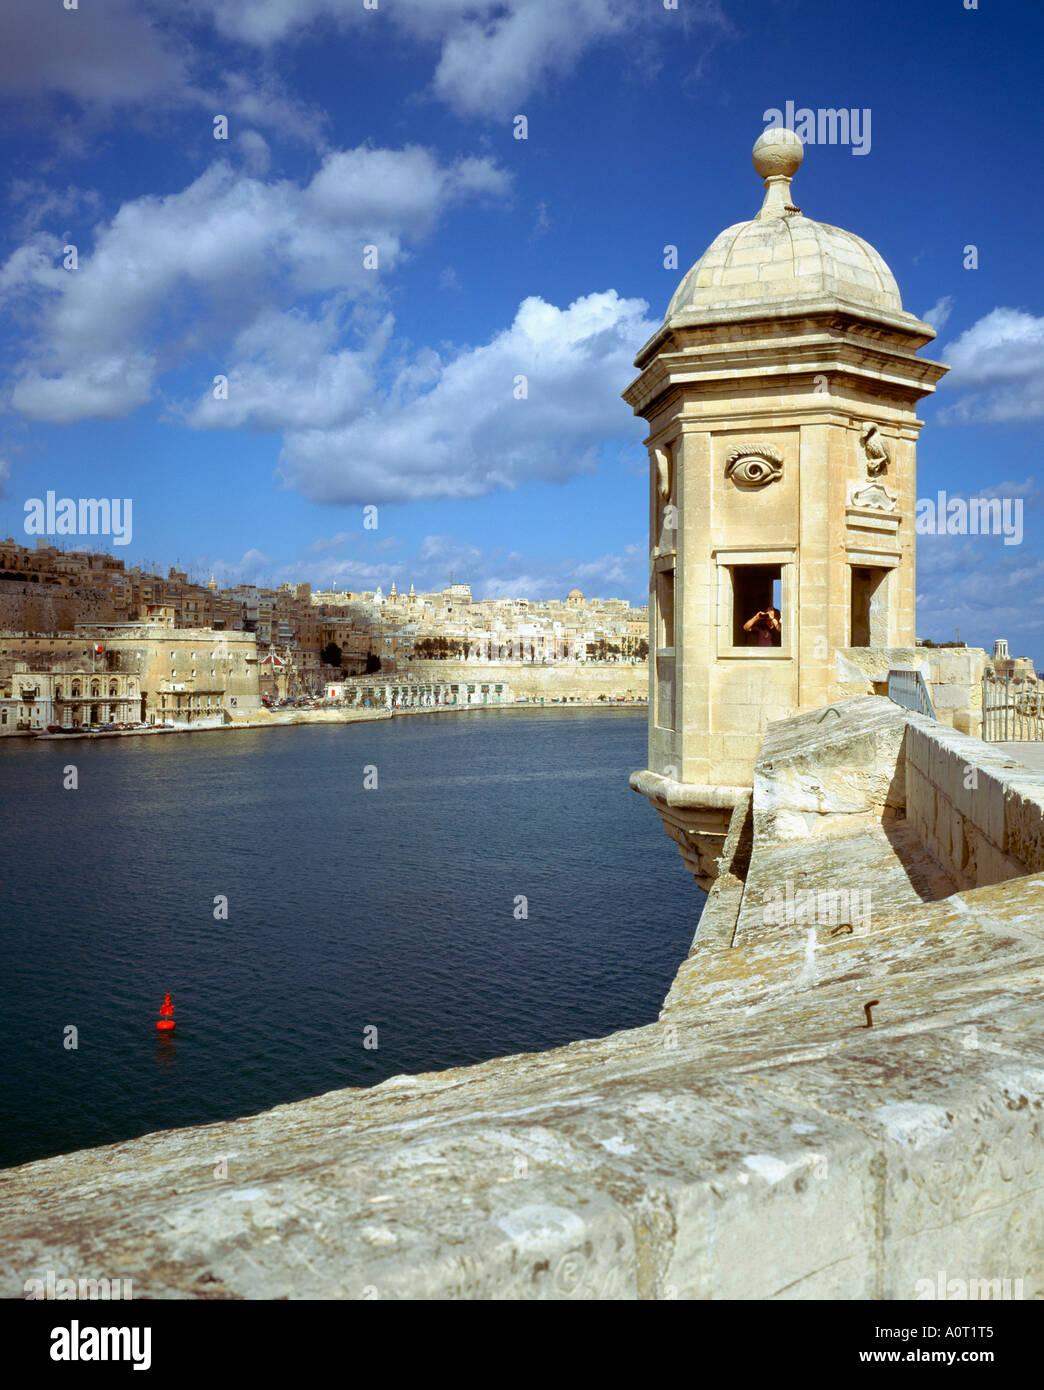 Fort St. Michael / Valletta - Stock Image